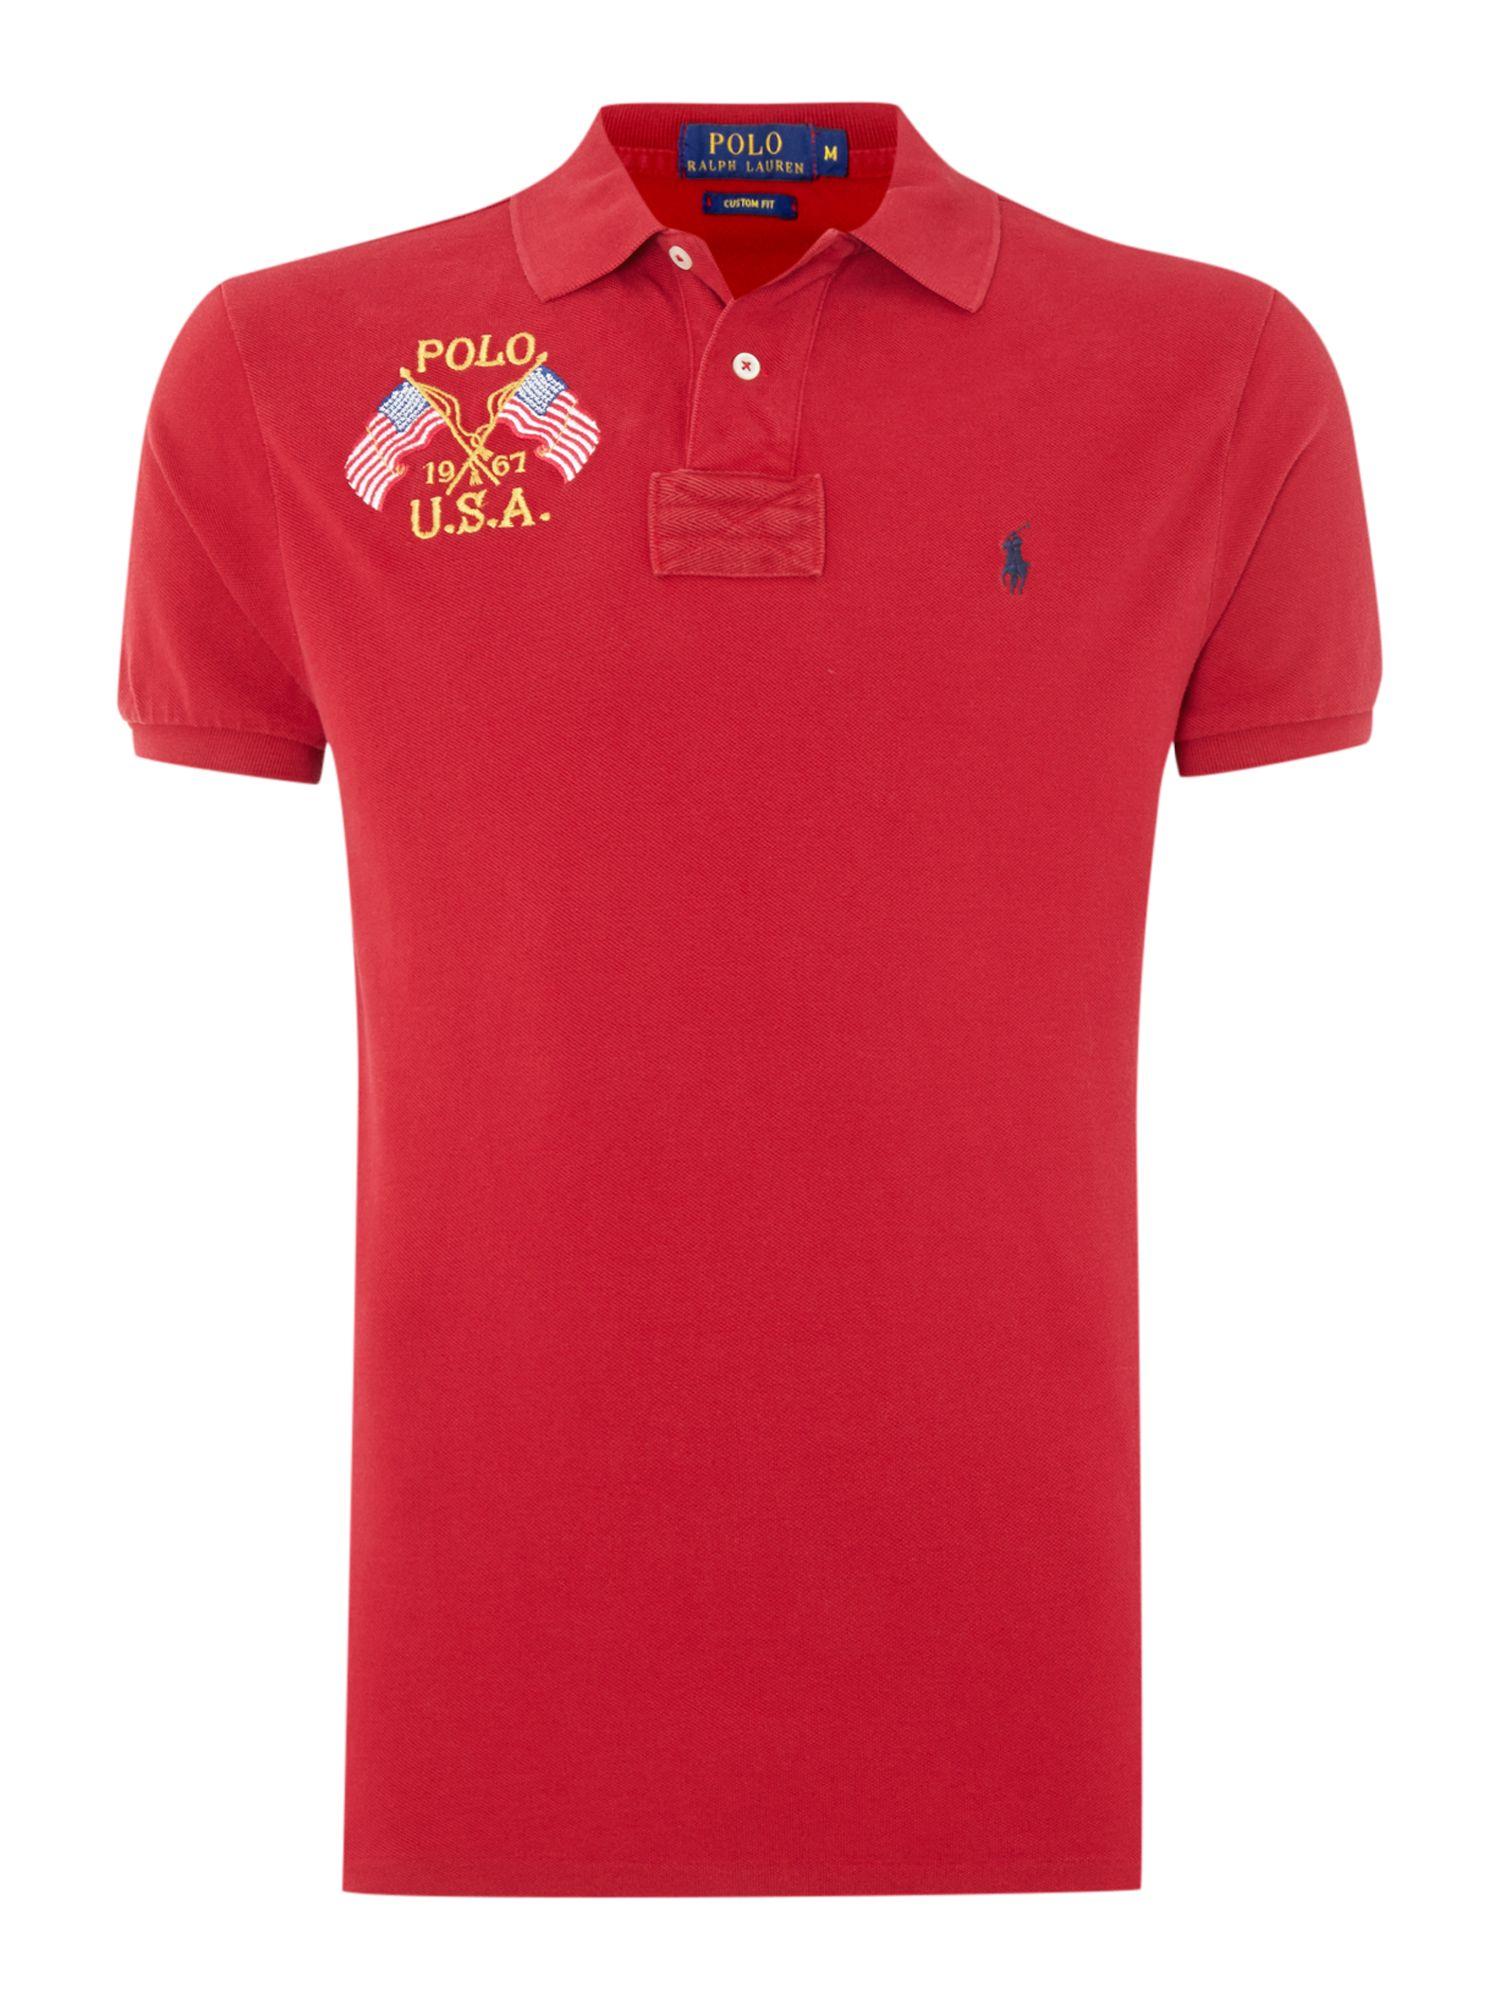 Polo Ralph Lauren Custom Fit Short Sleeve Mesh Wflag Polo